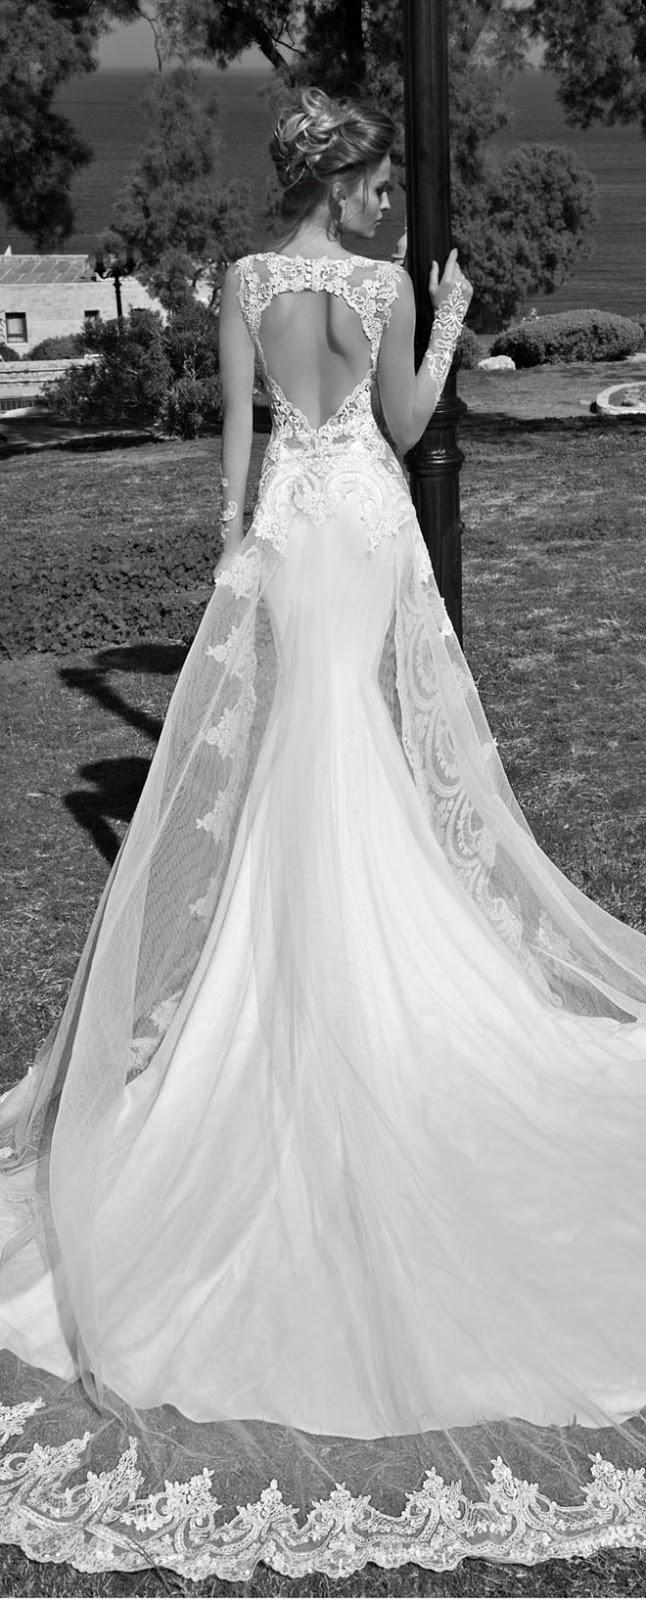 Galia Lahav Spring 2015 La Dolce Vita Bridal Collection Fashion Shared